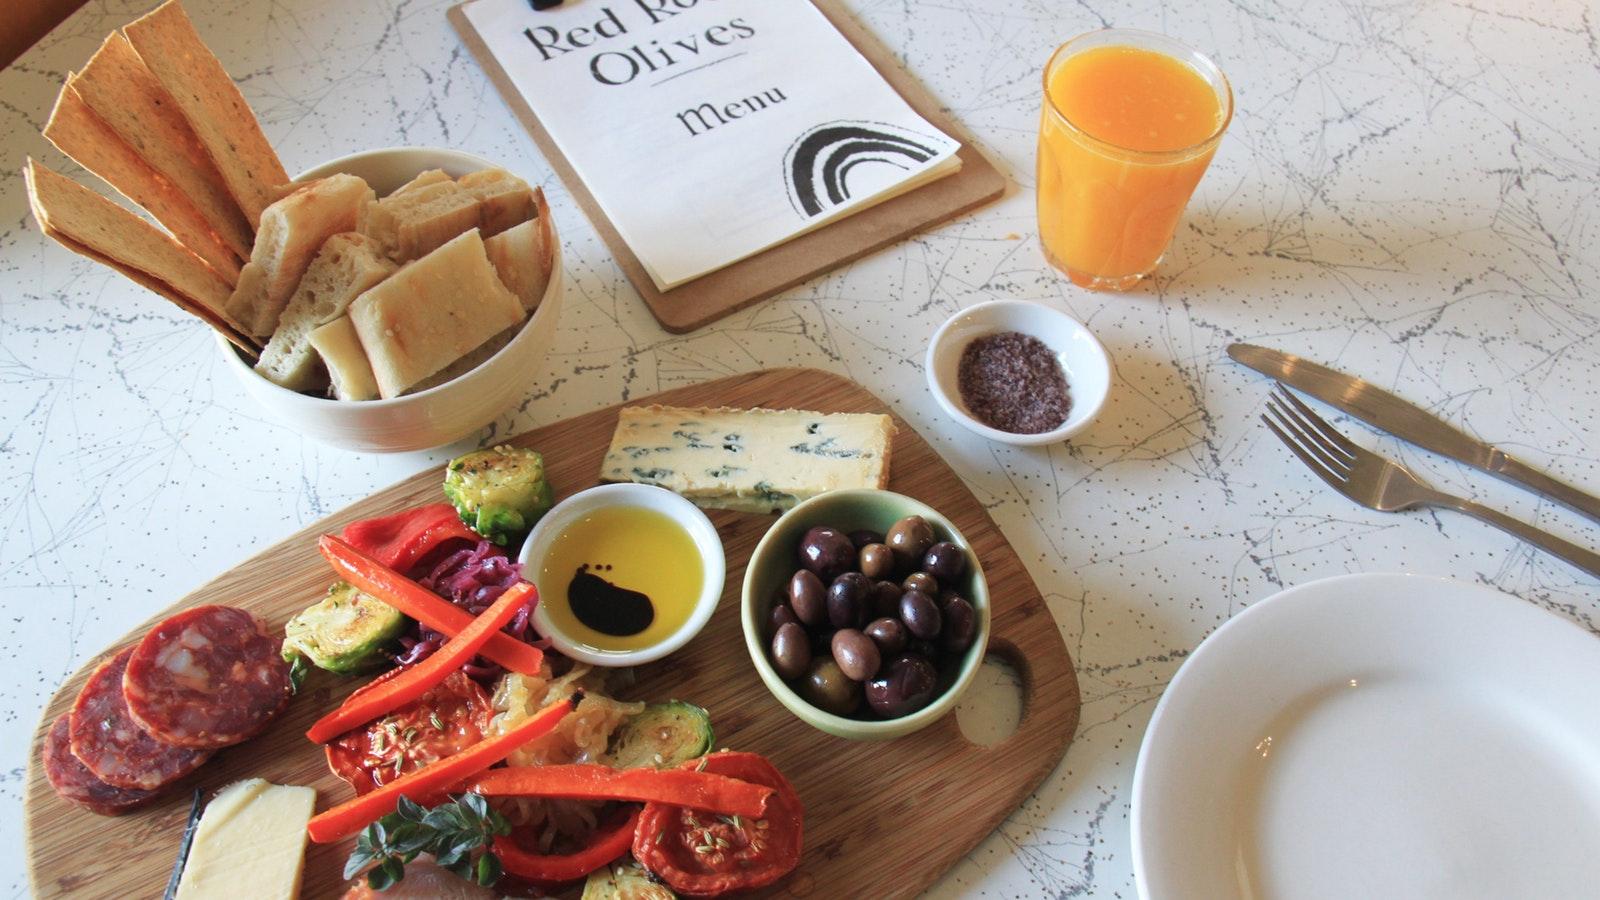 Red Rock Olives Grazing Platter